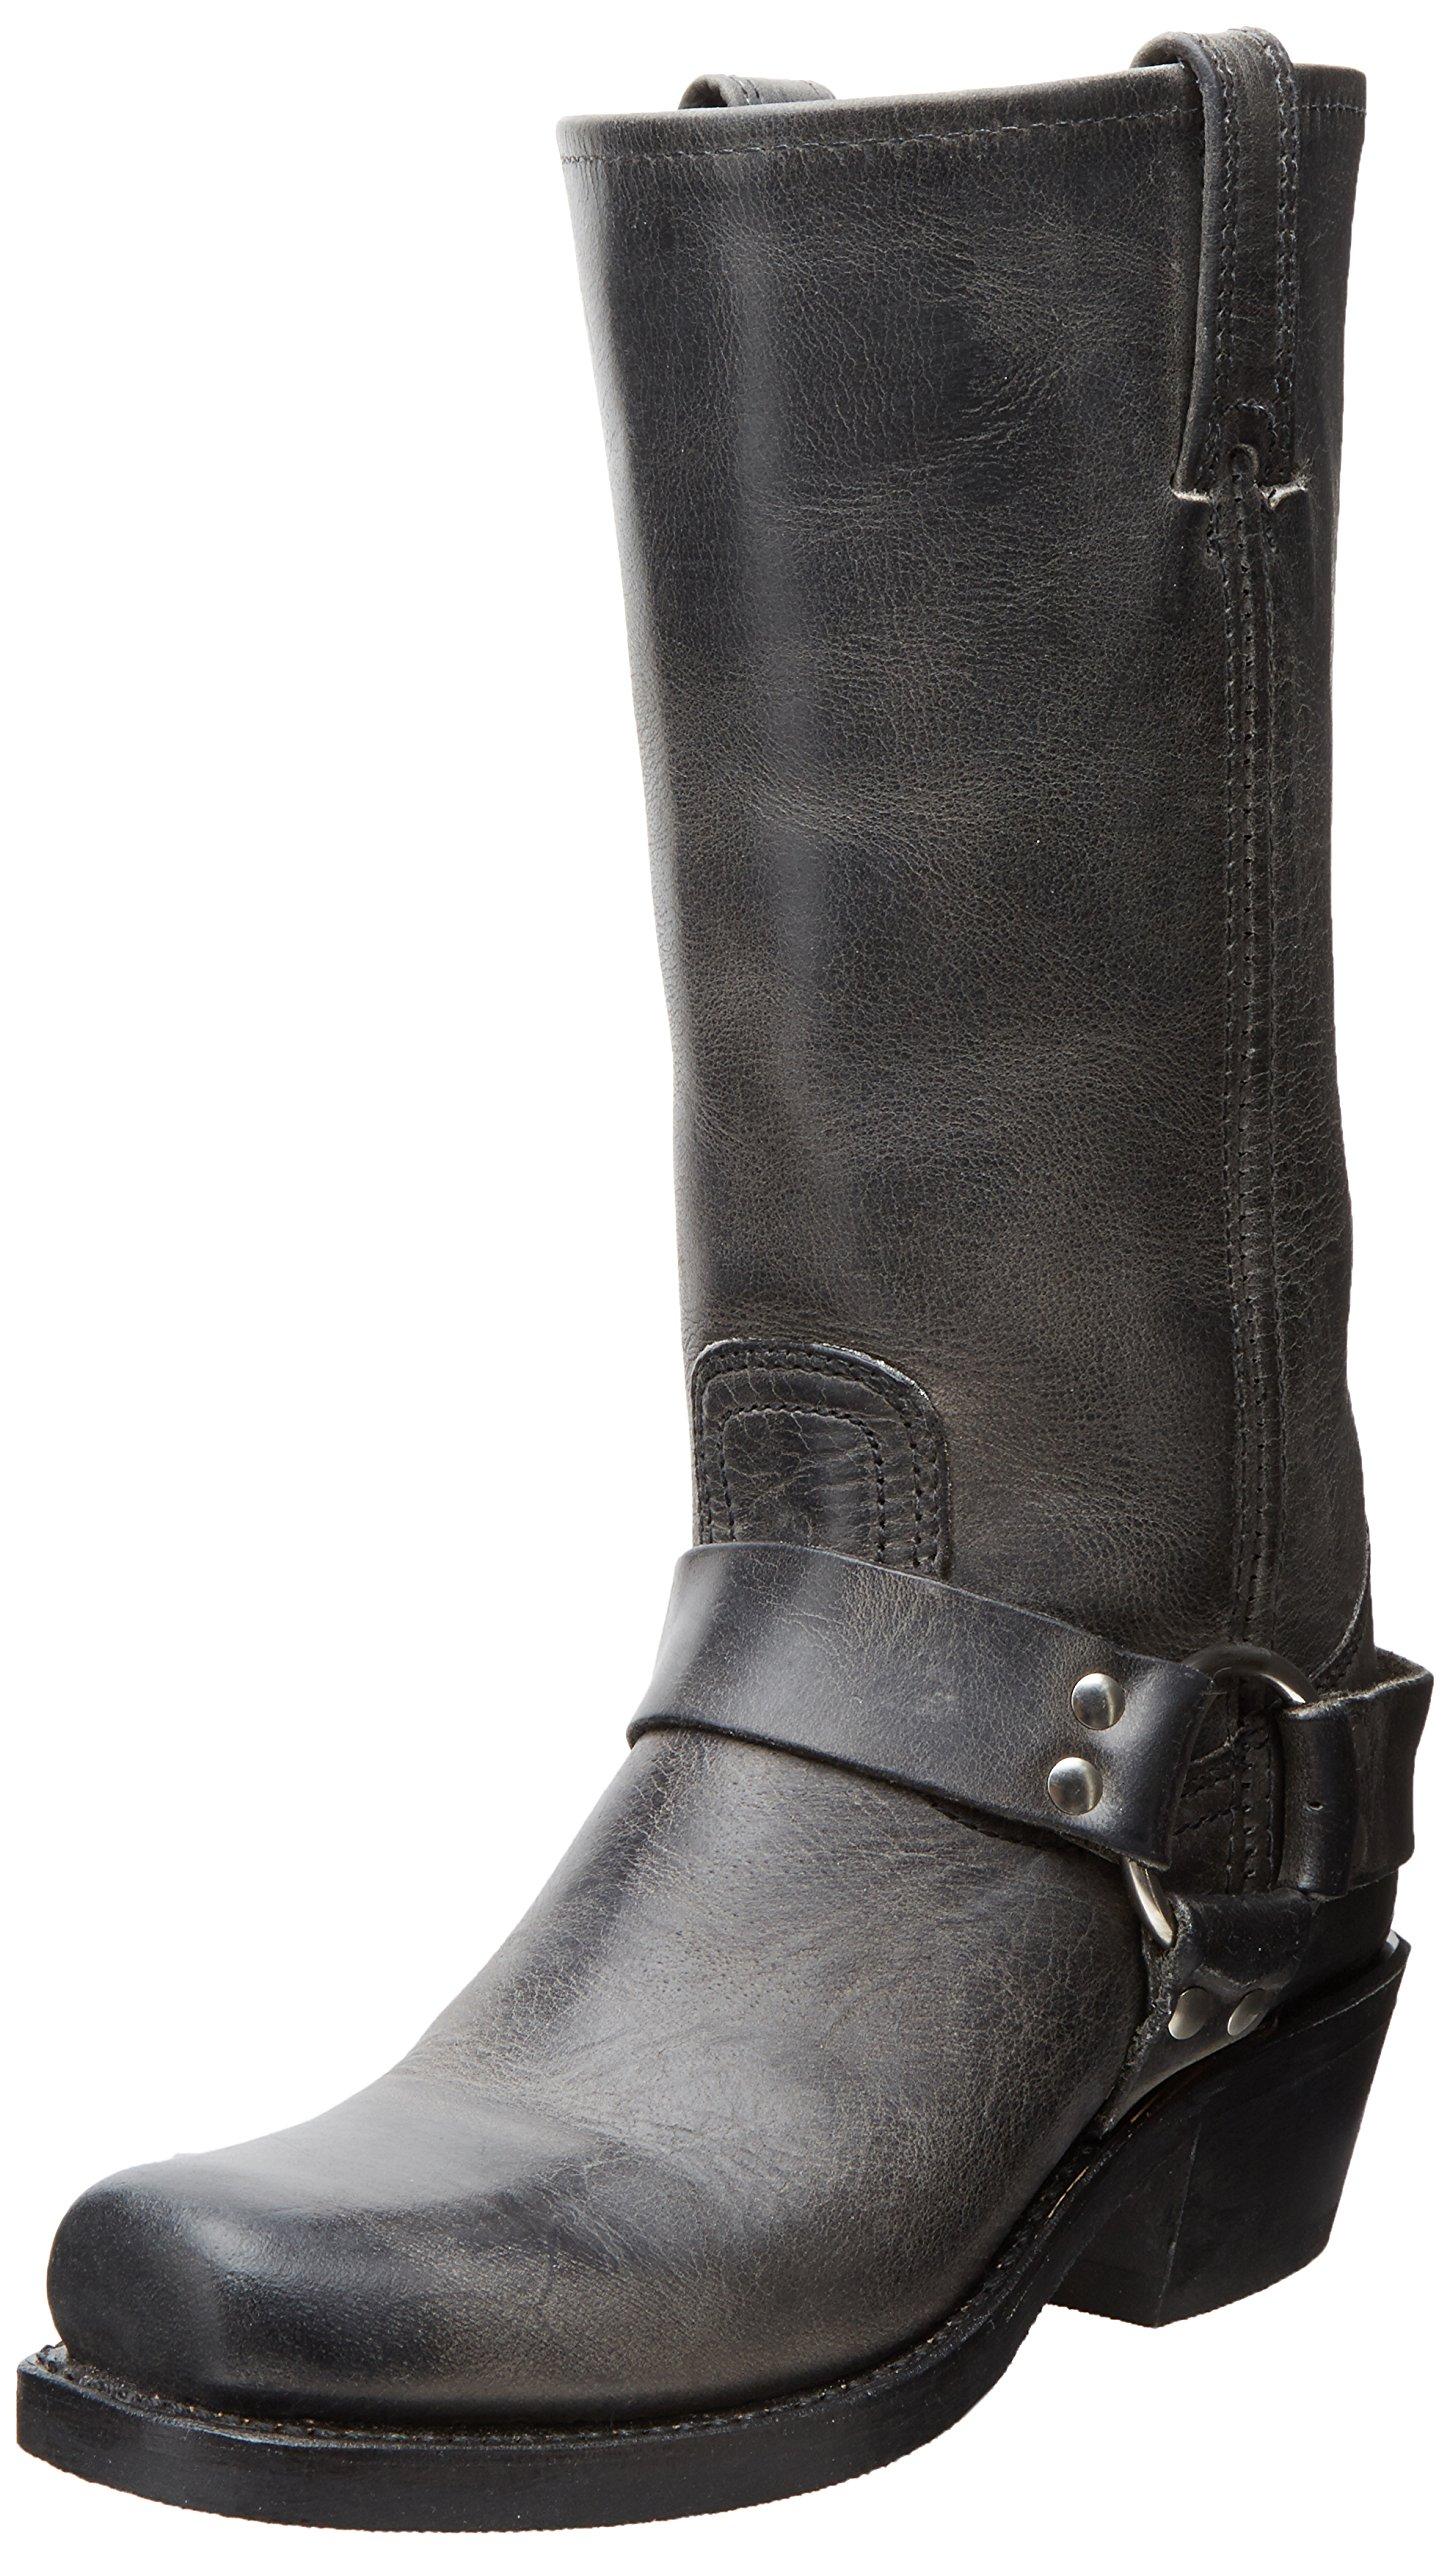 FRYE Women's Harness 12R Boot, Charcoal, 6.5 M US